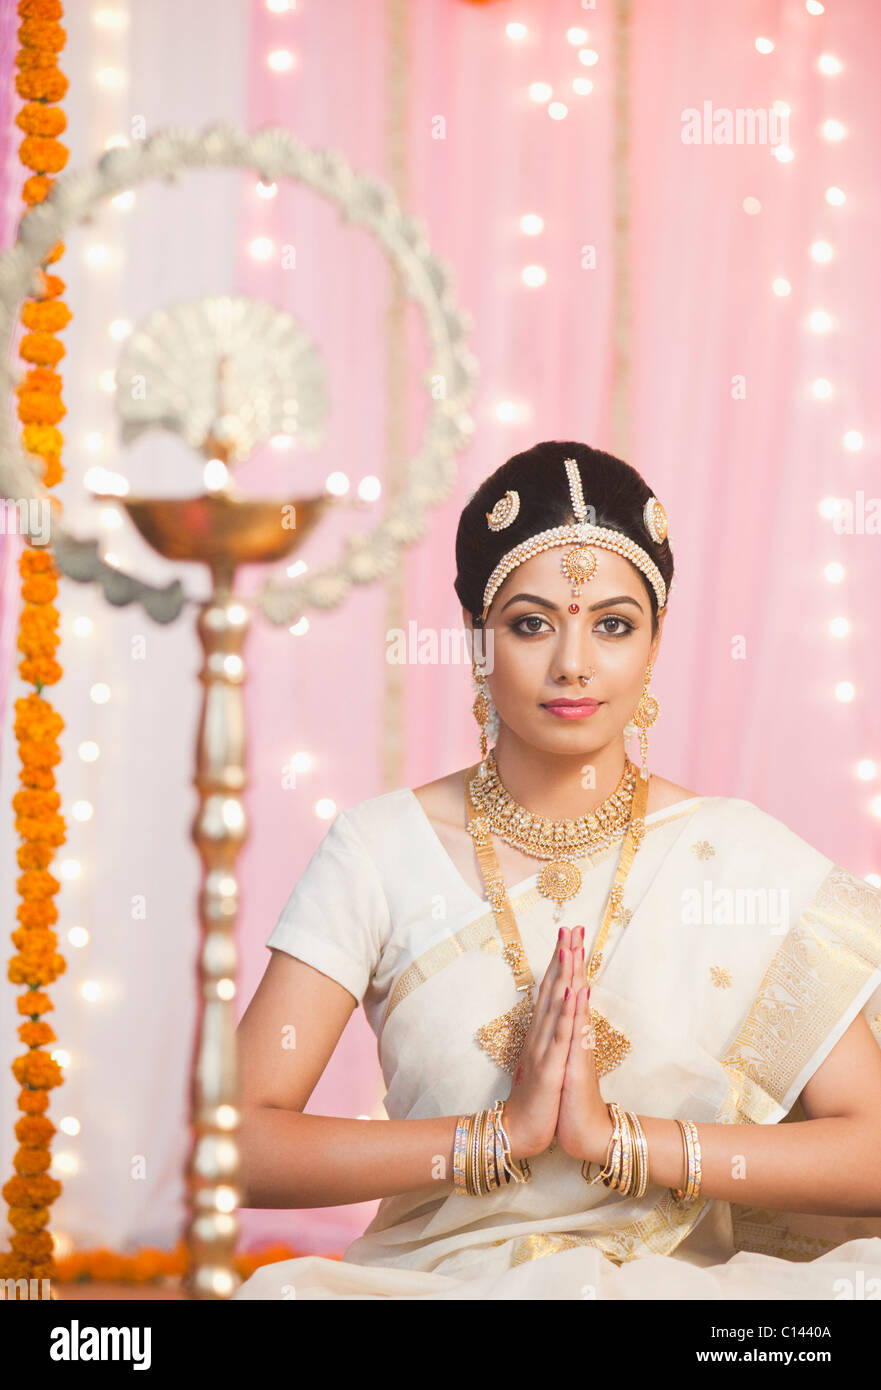 Indian Bride Oil Lamp Stock Photos & Indian Bride Oil Lamp Stock ...